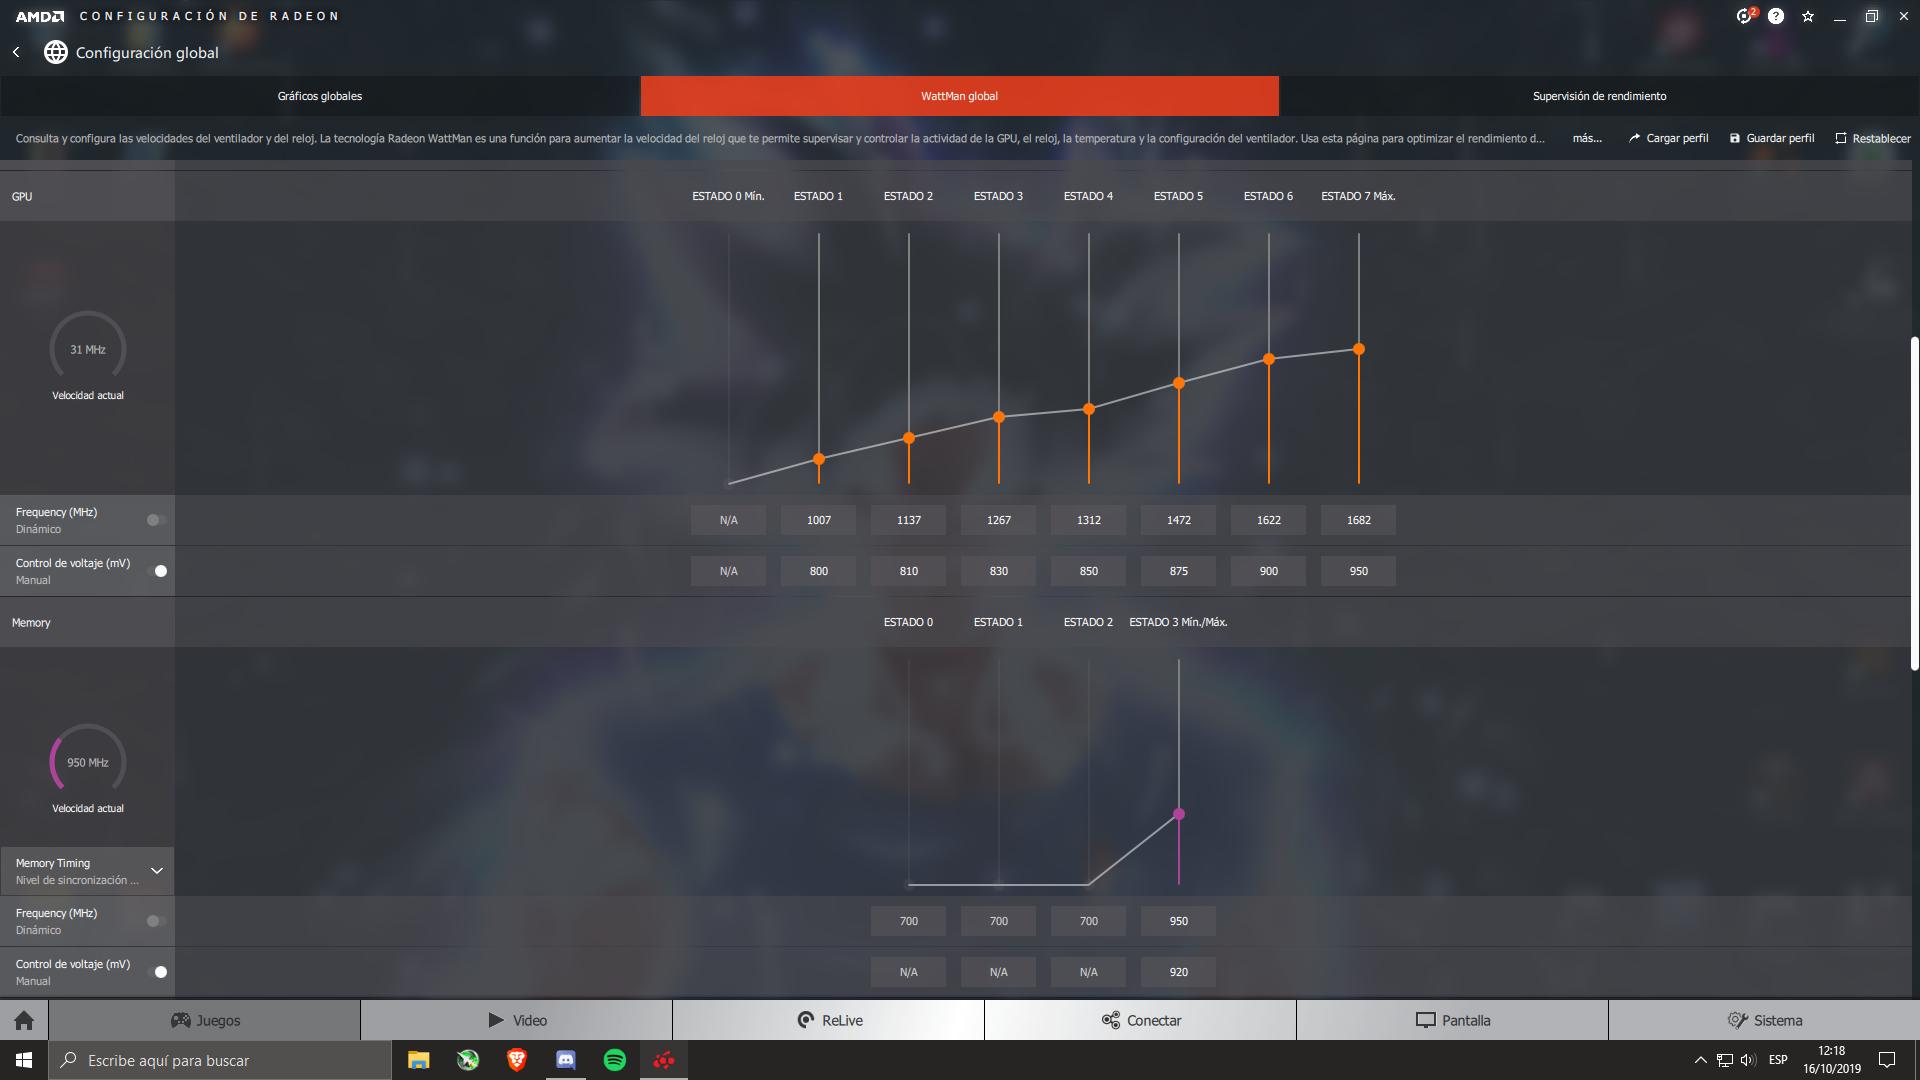 [Hilo oficial] AMD Radeon RX Vega 56 y Vega 64